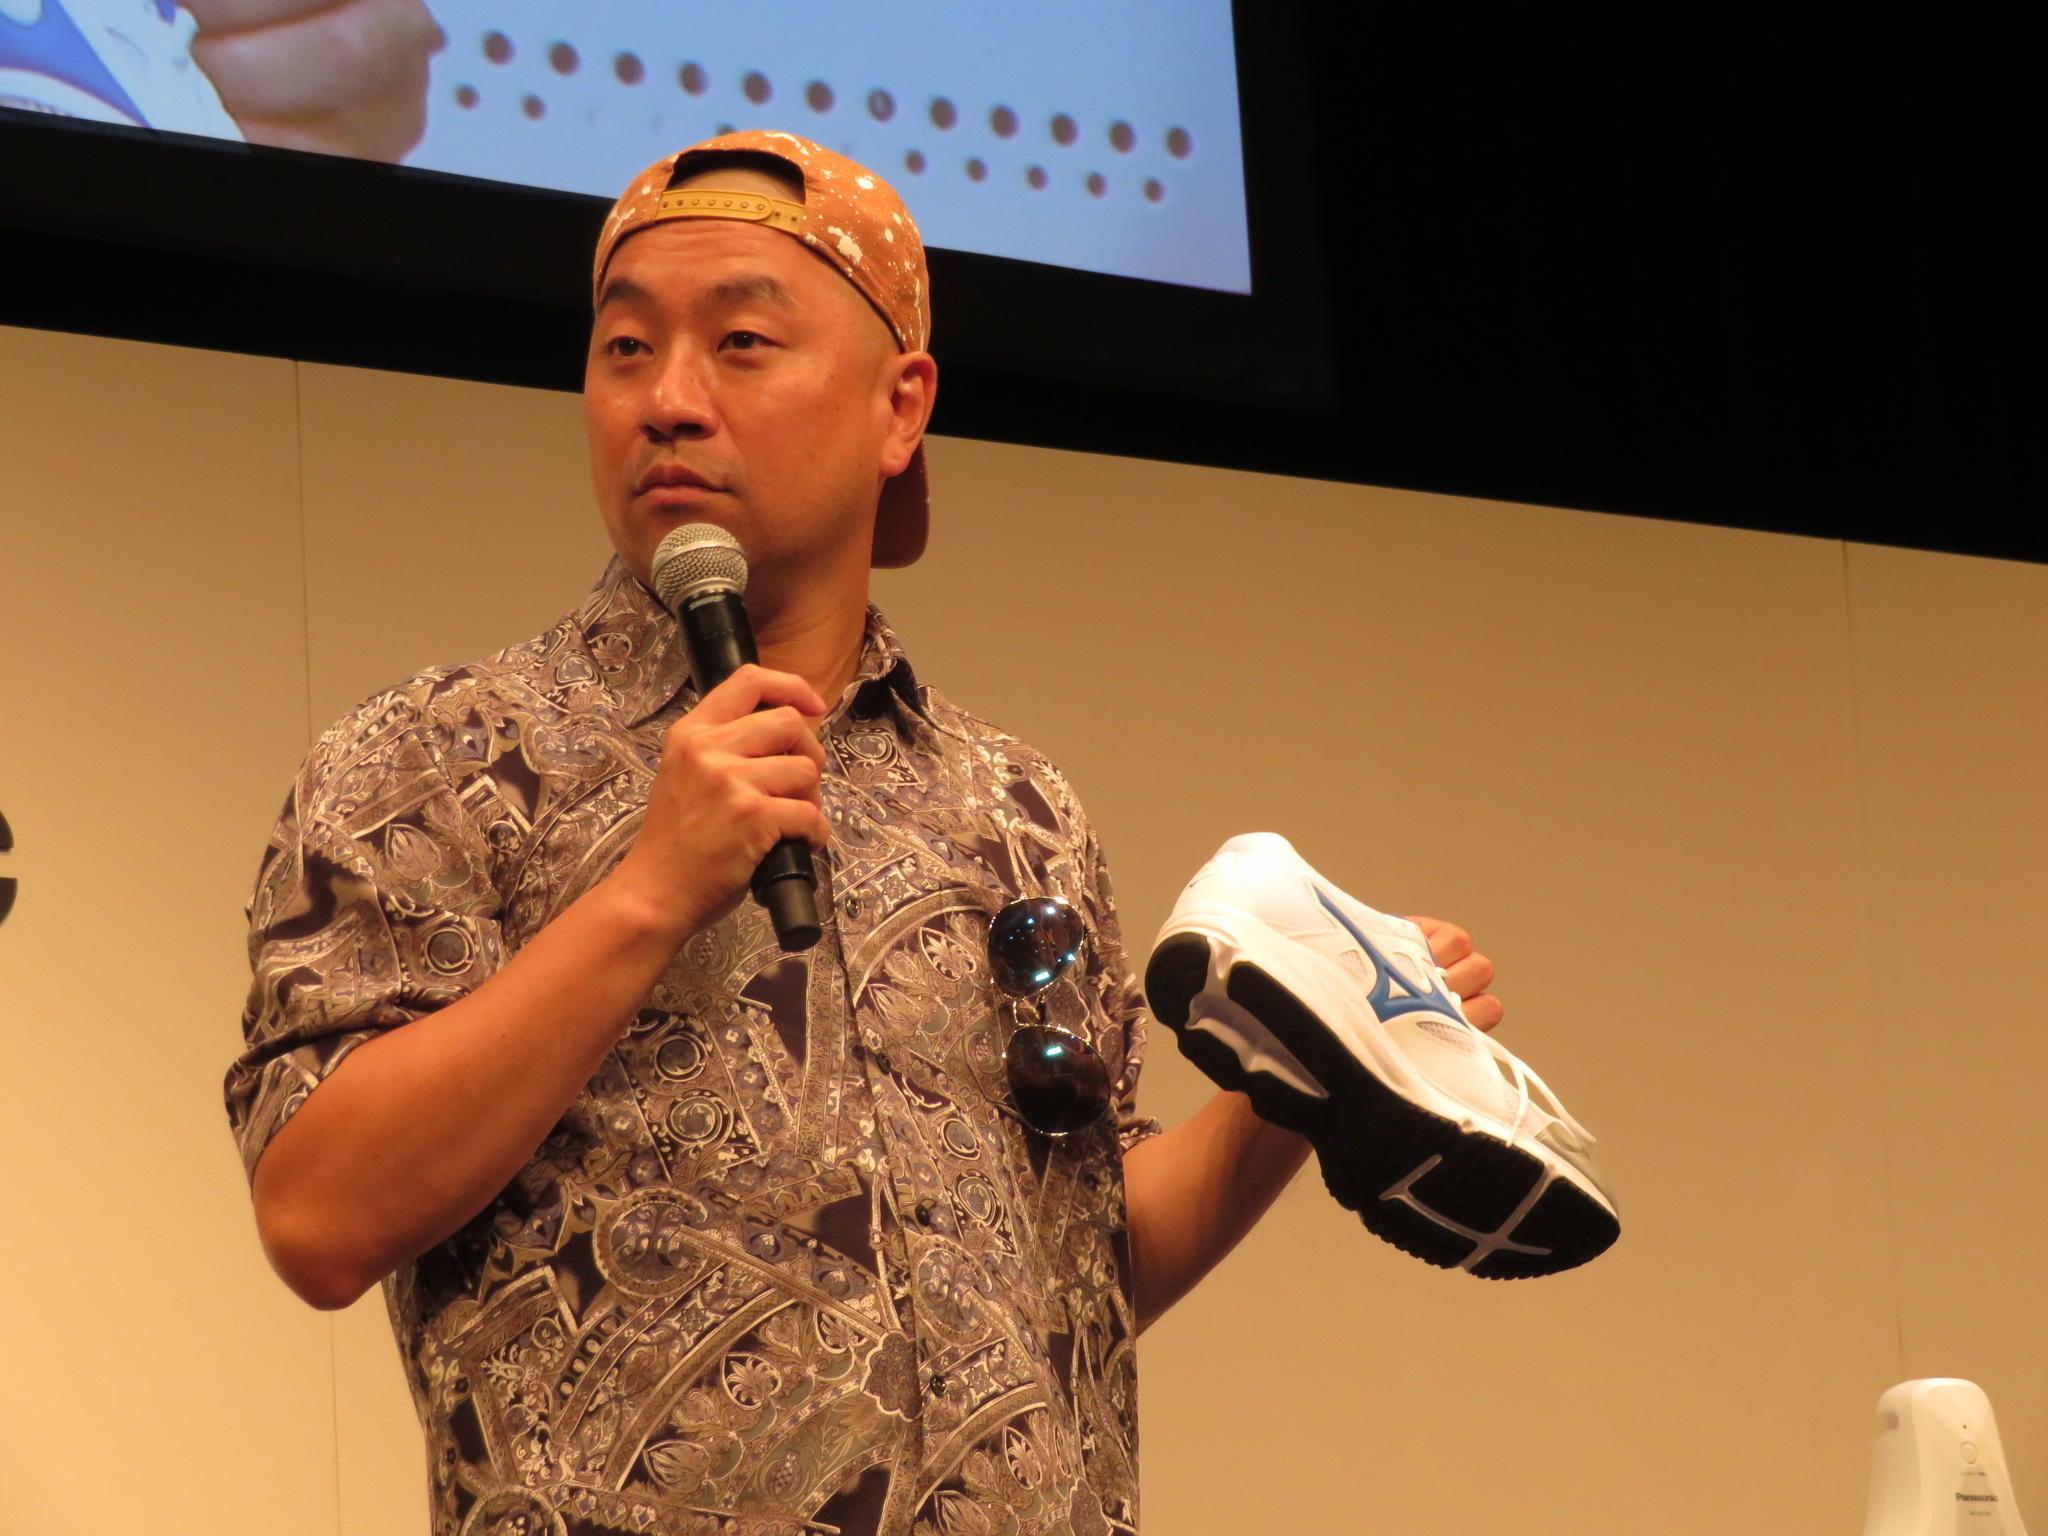 http://news.yoshimoto.co.jp/20180810011206-58f4685e42852b44131555d088f8934e9ed010af.jpg